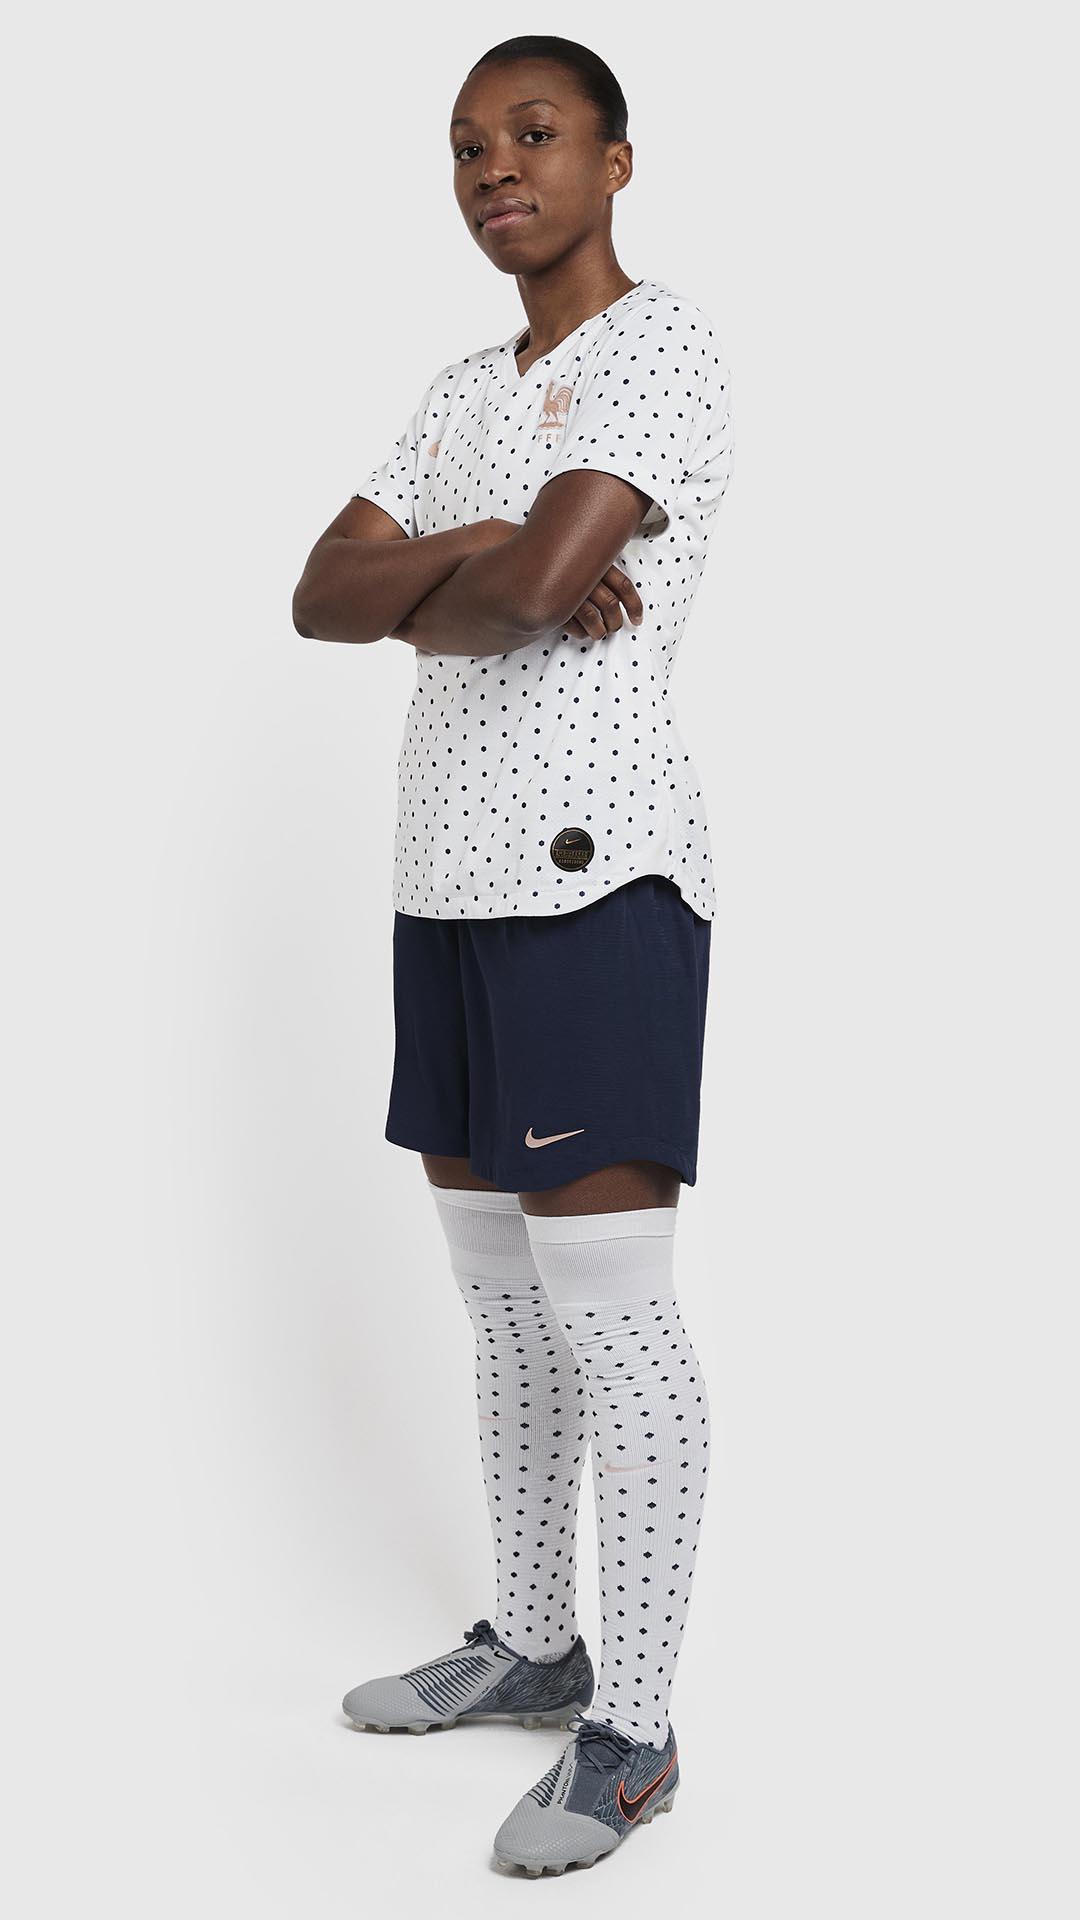 the latest 9ee67 b7c5f France 2019 Women's World Cup Nike Kits - FOOTBALL FASHION.ORG